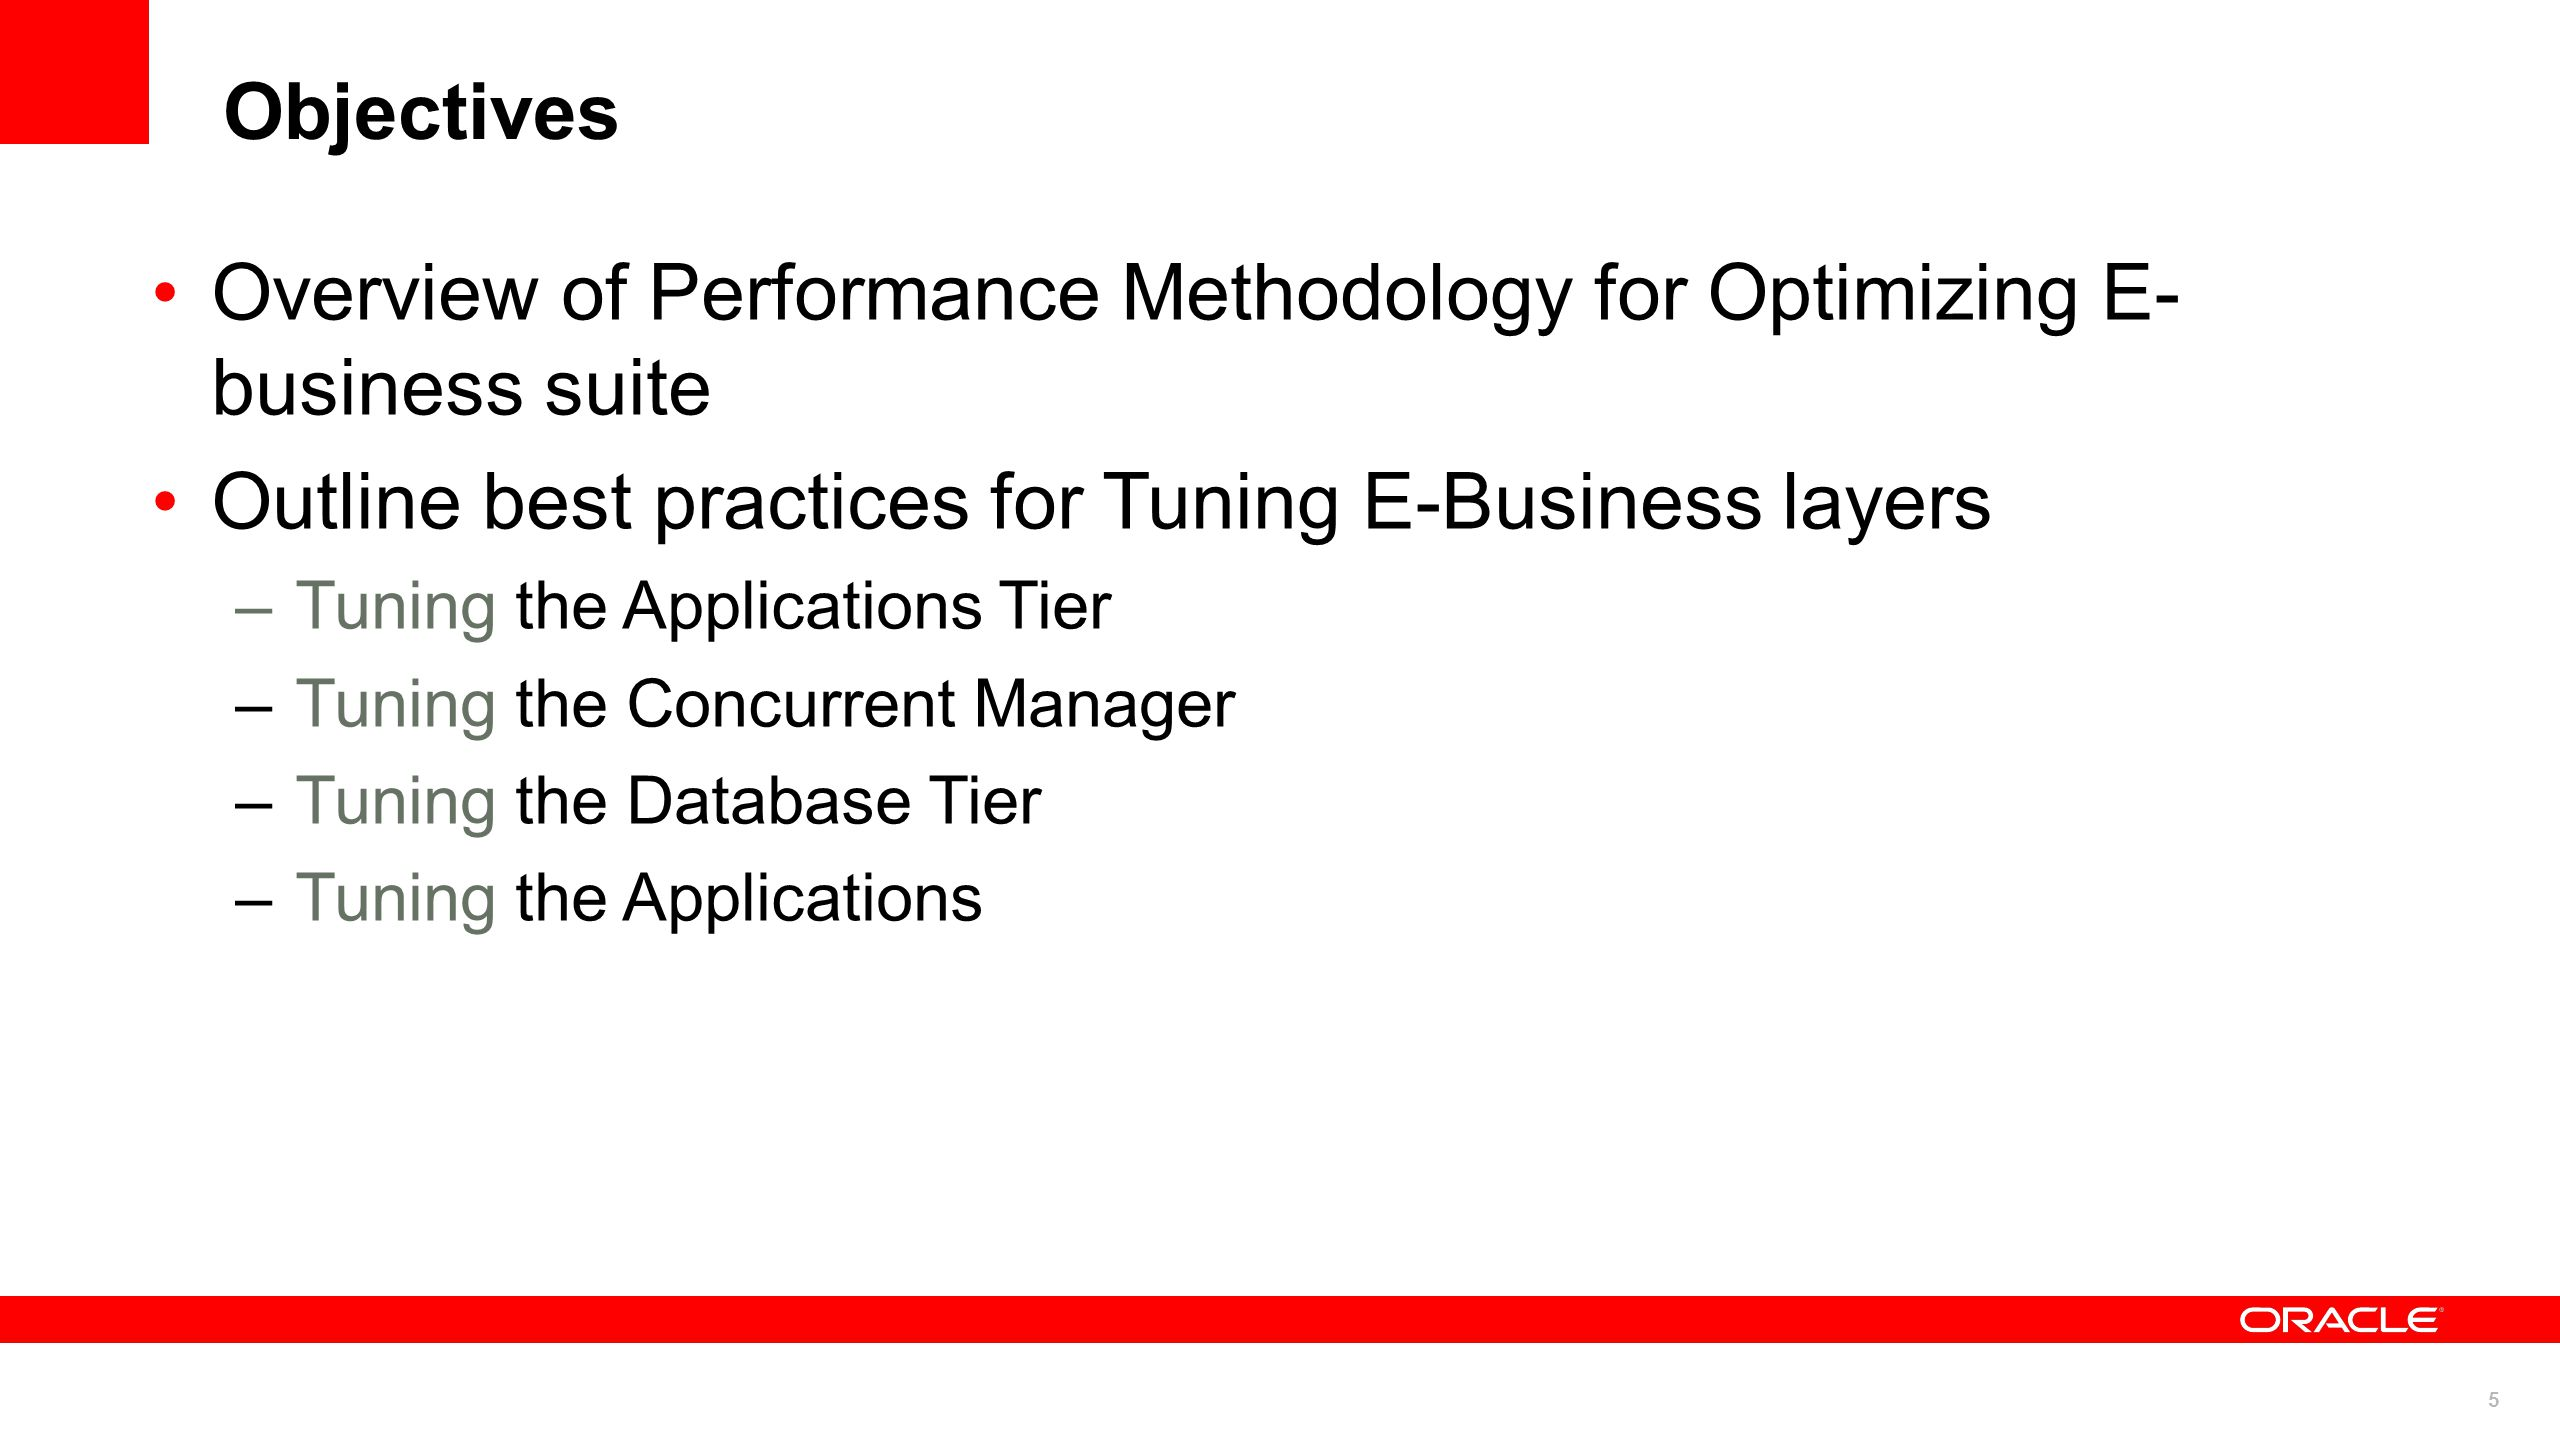 6 R12 Apps Basic Layers / Products B r o w s er Lis ten er mod_oc4j mod_proxy mod_plsql mod_osso Apache JVM1 App1App2 OC4J oc4j_security LDAP Oracle Forms Repository OID RAC Database + db Listener IdM JVM2 App3App2 Concurrent Processor, Manager Ext.